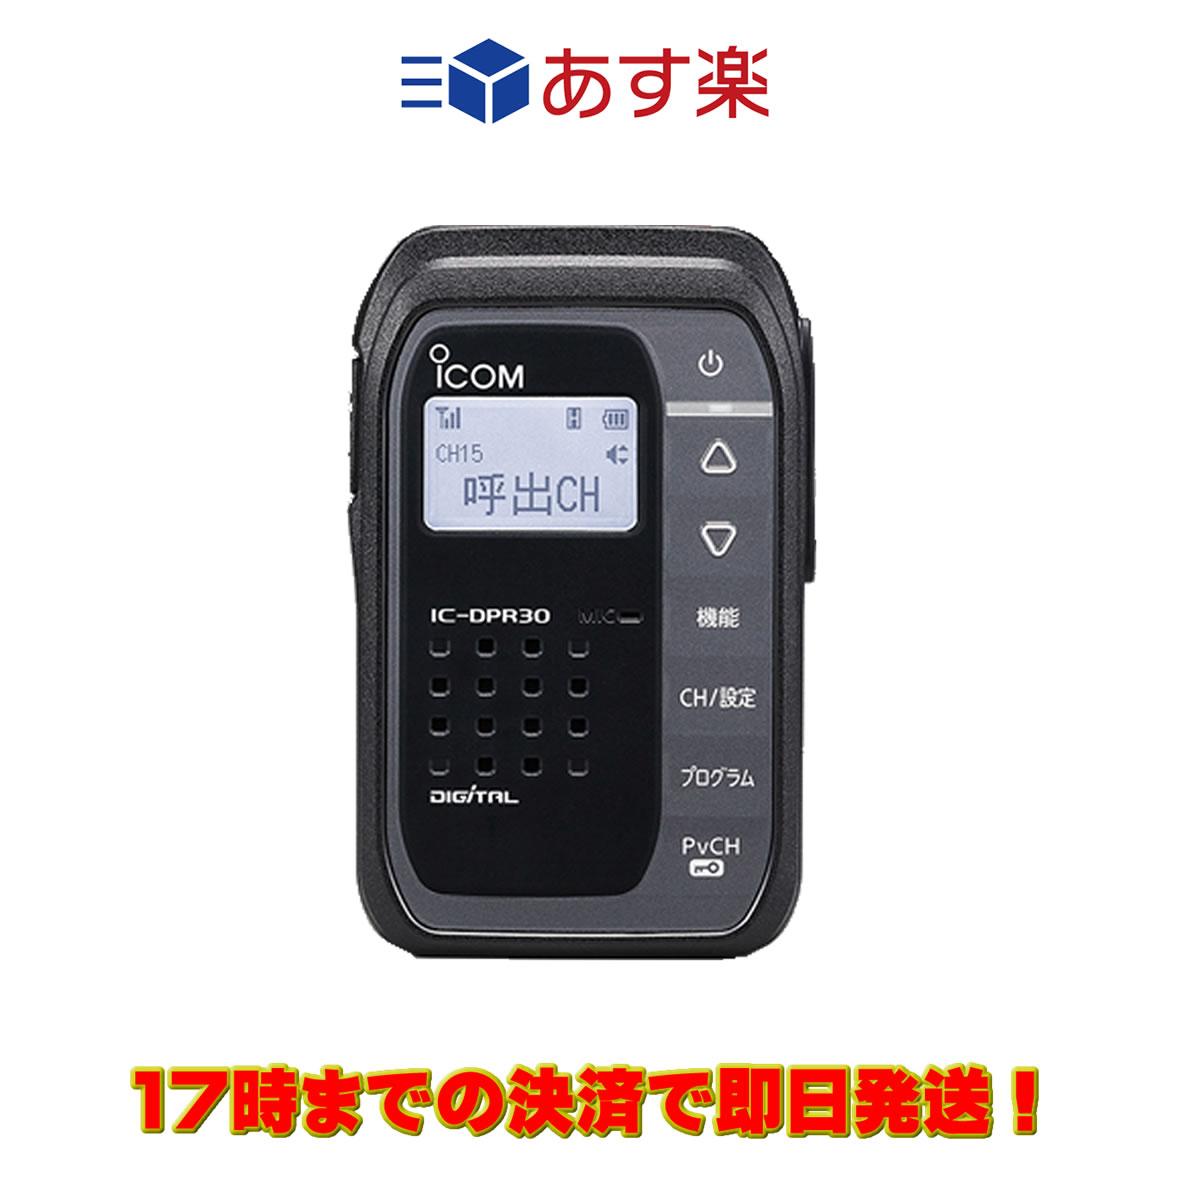 IC-DPR30(BLACK) アイコム 携帯型デジタルトランシーバー